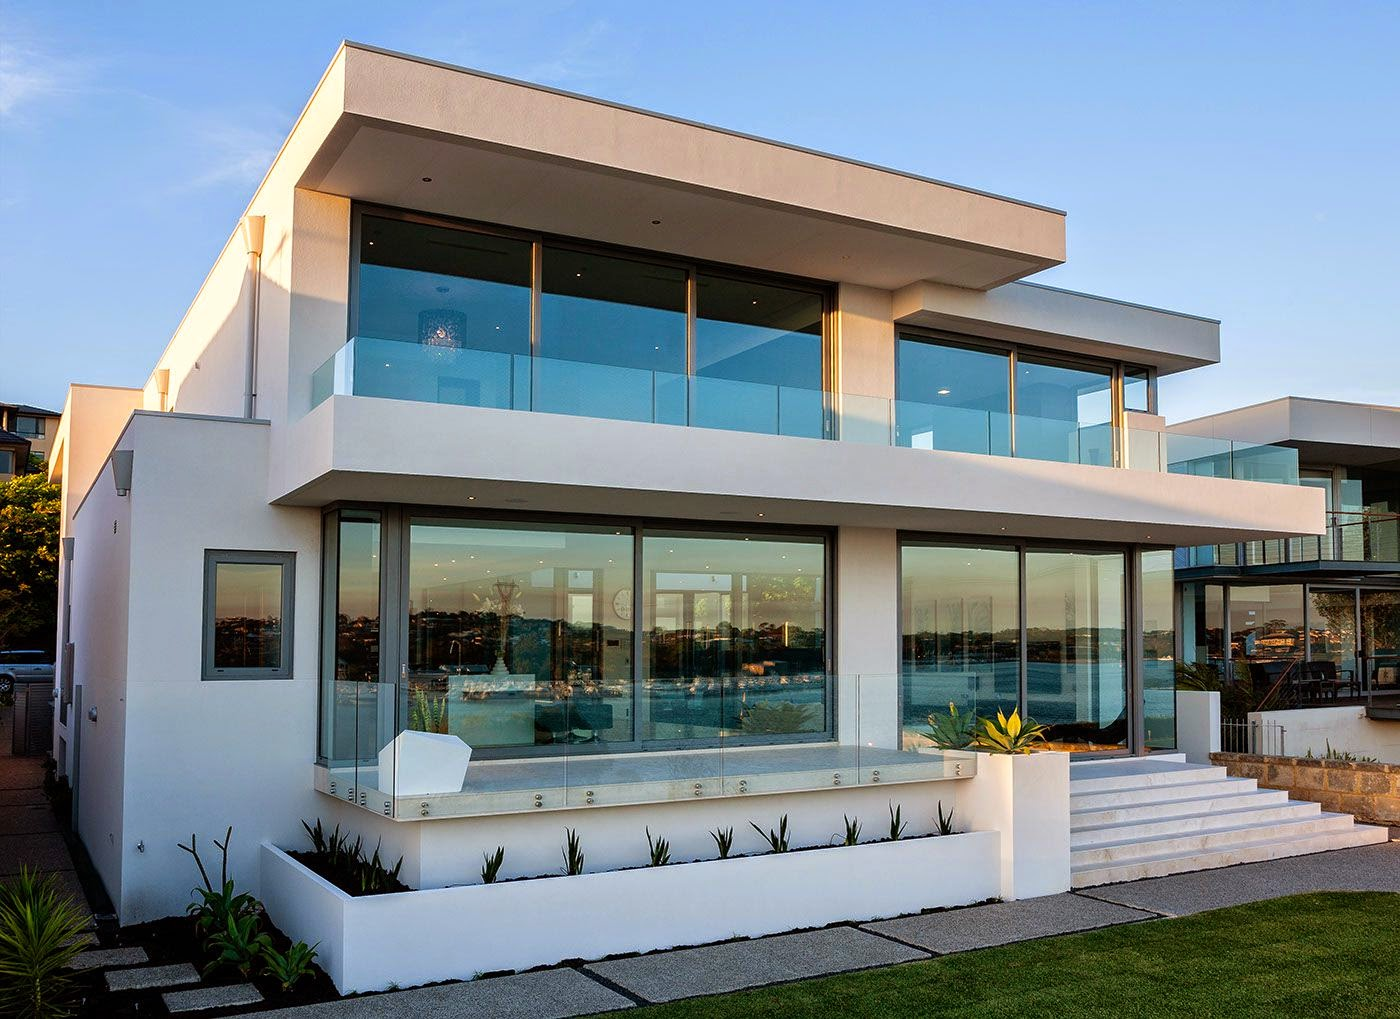 Hogares frescos relajada y acogedora moderna casa de la for Videos casas modernas